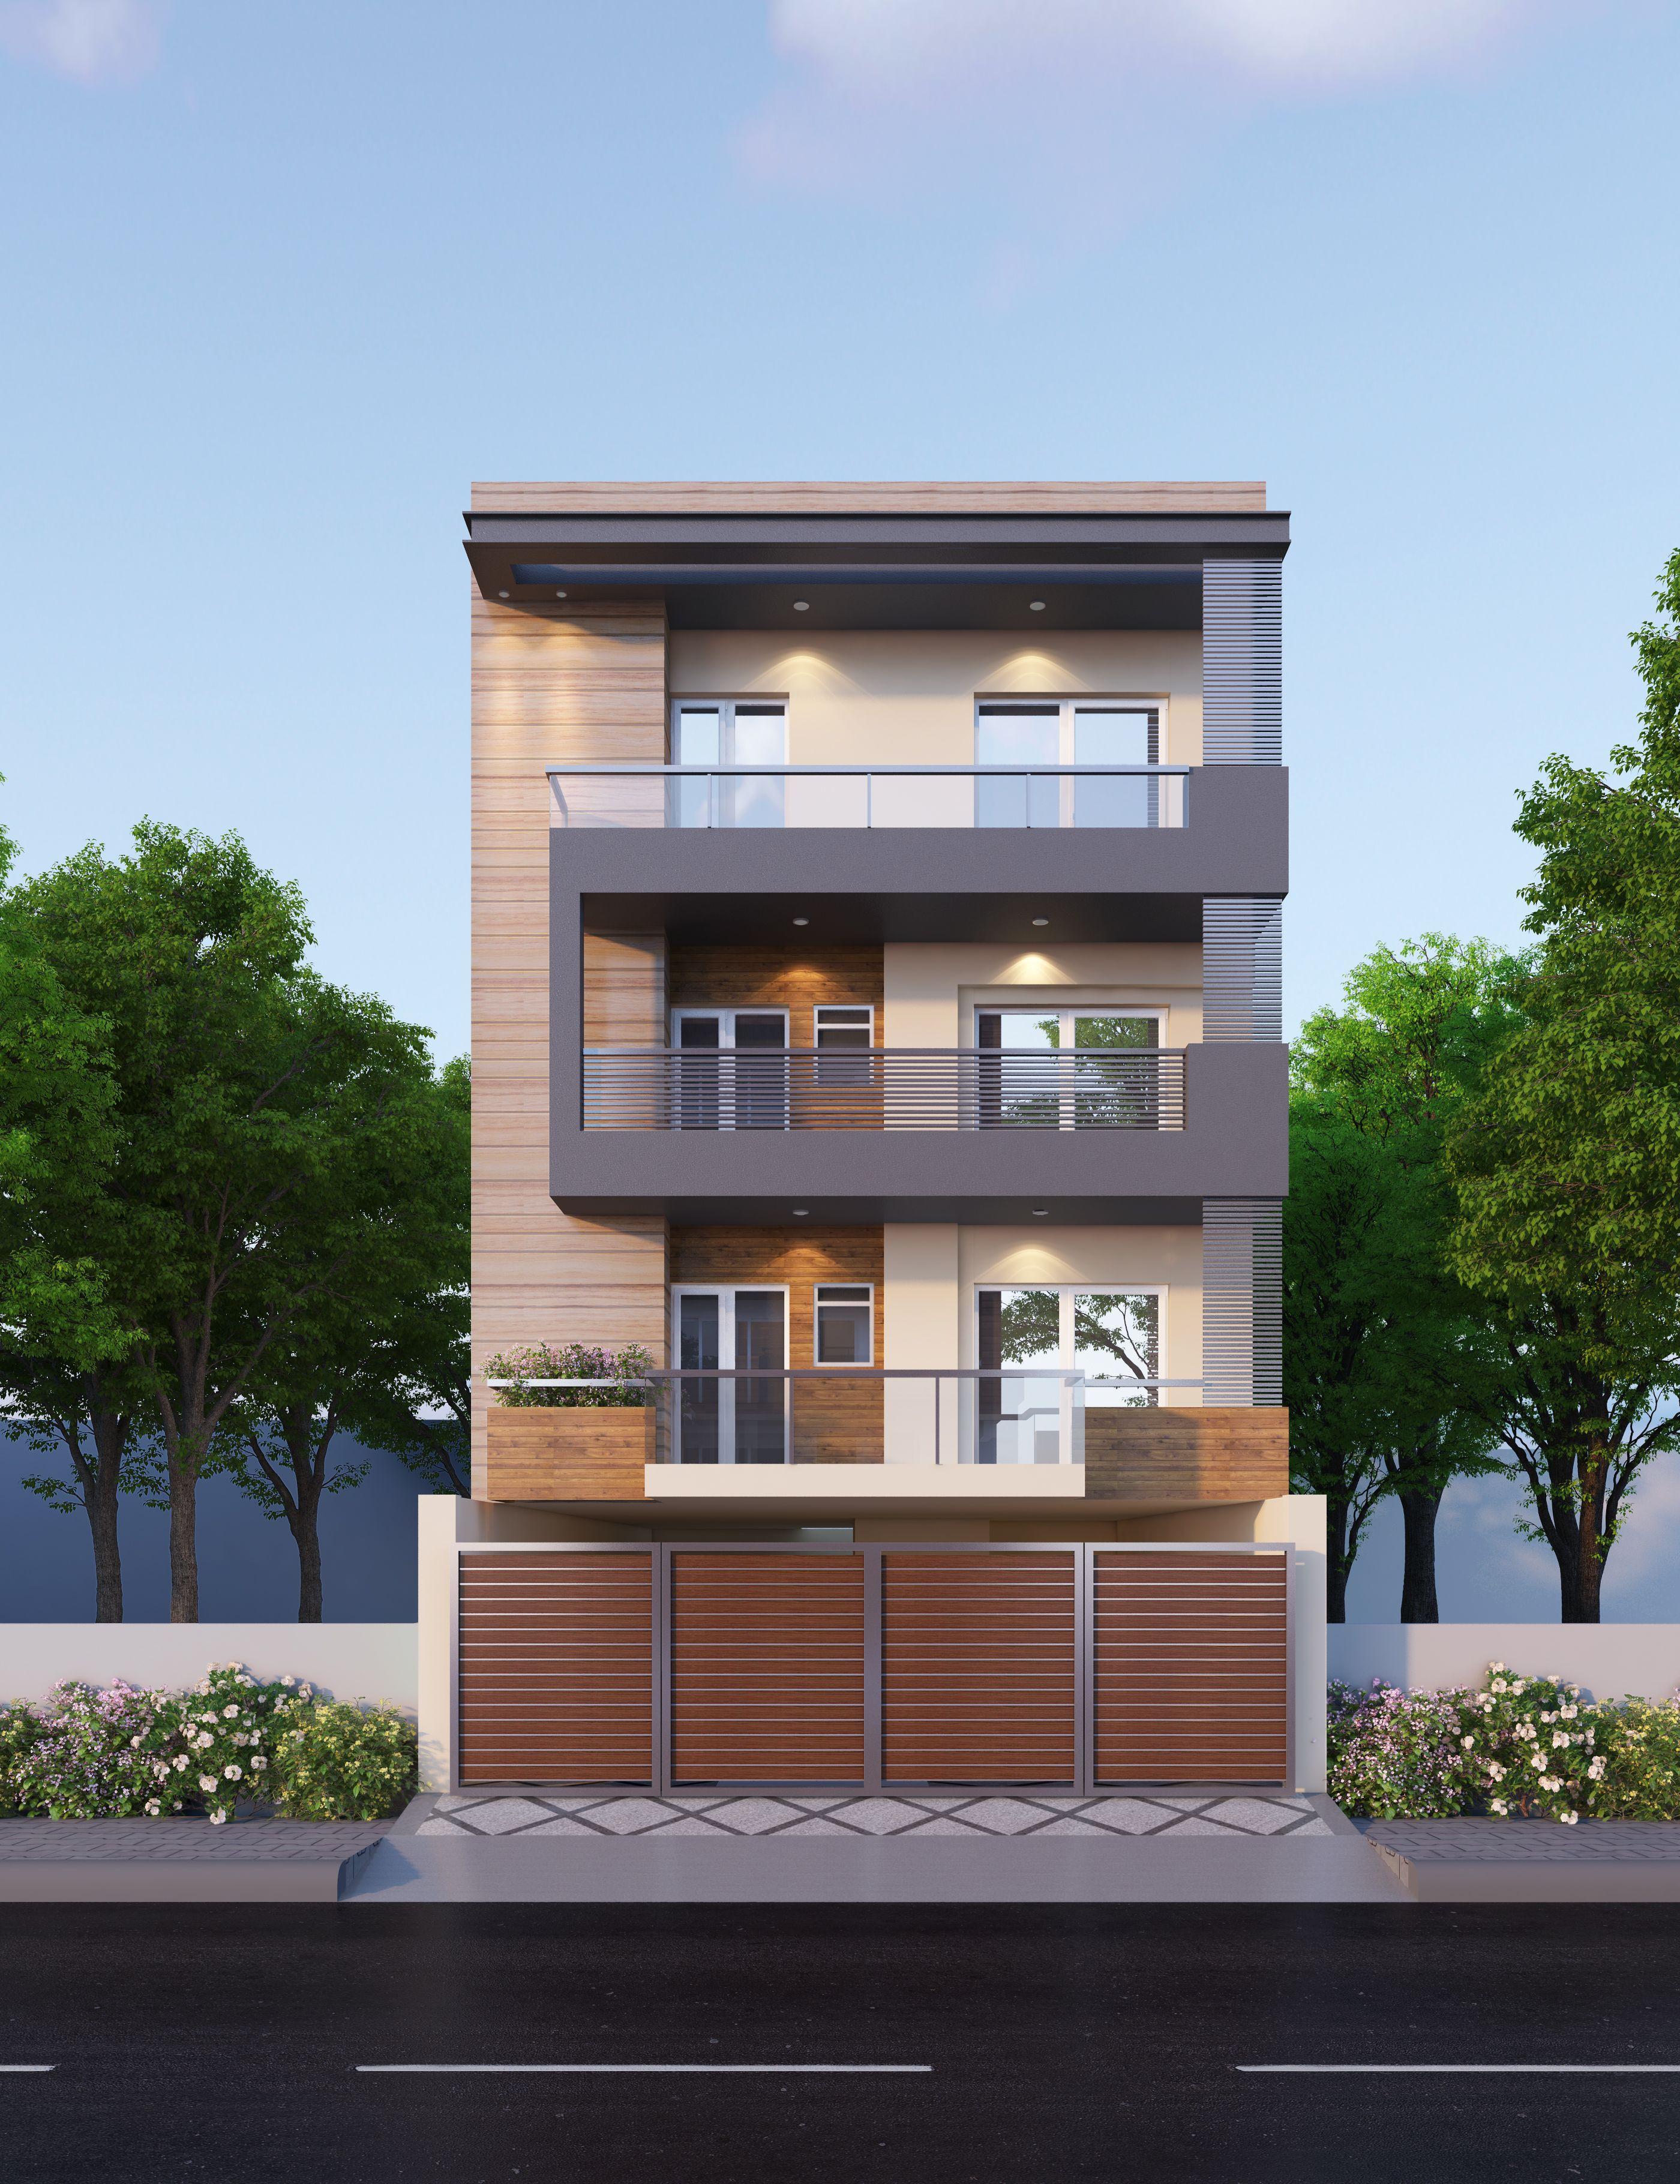 e5a6dd4fe7b78b91e469d3a9fc57b185 - 25+ Small House Design In Delhi  Gif